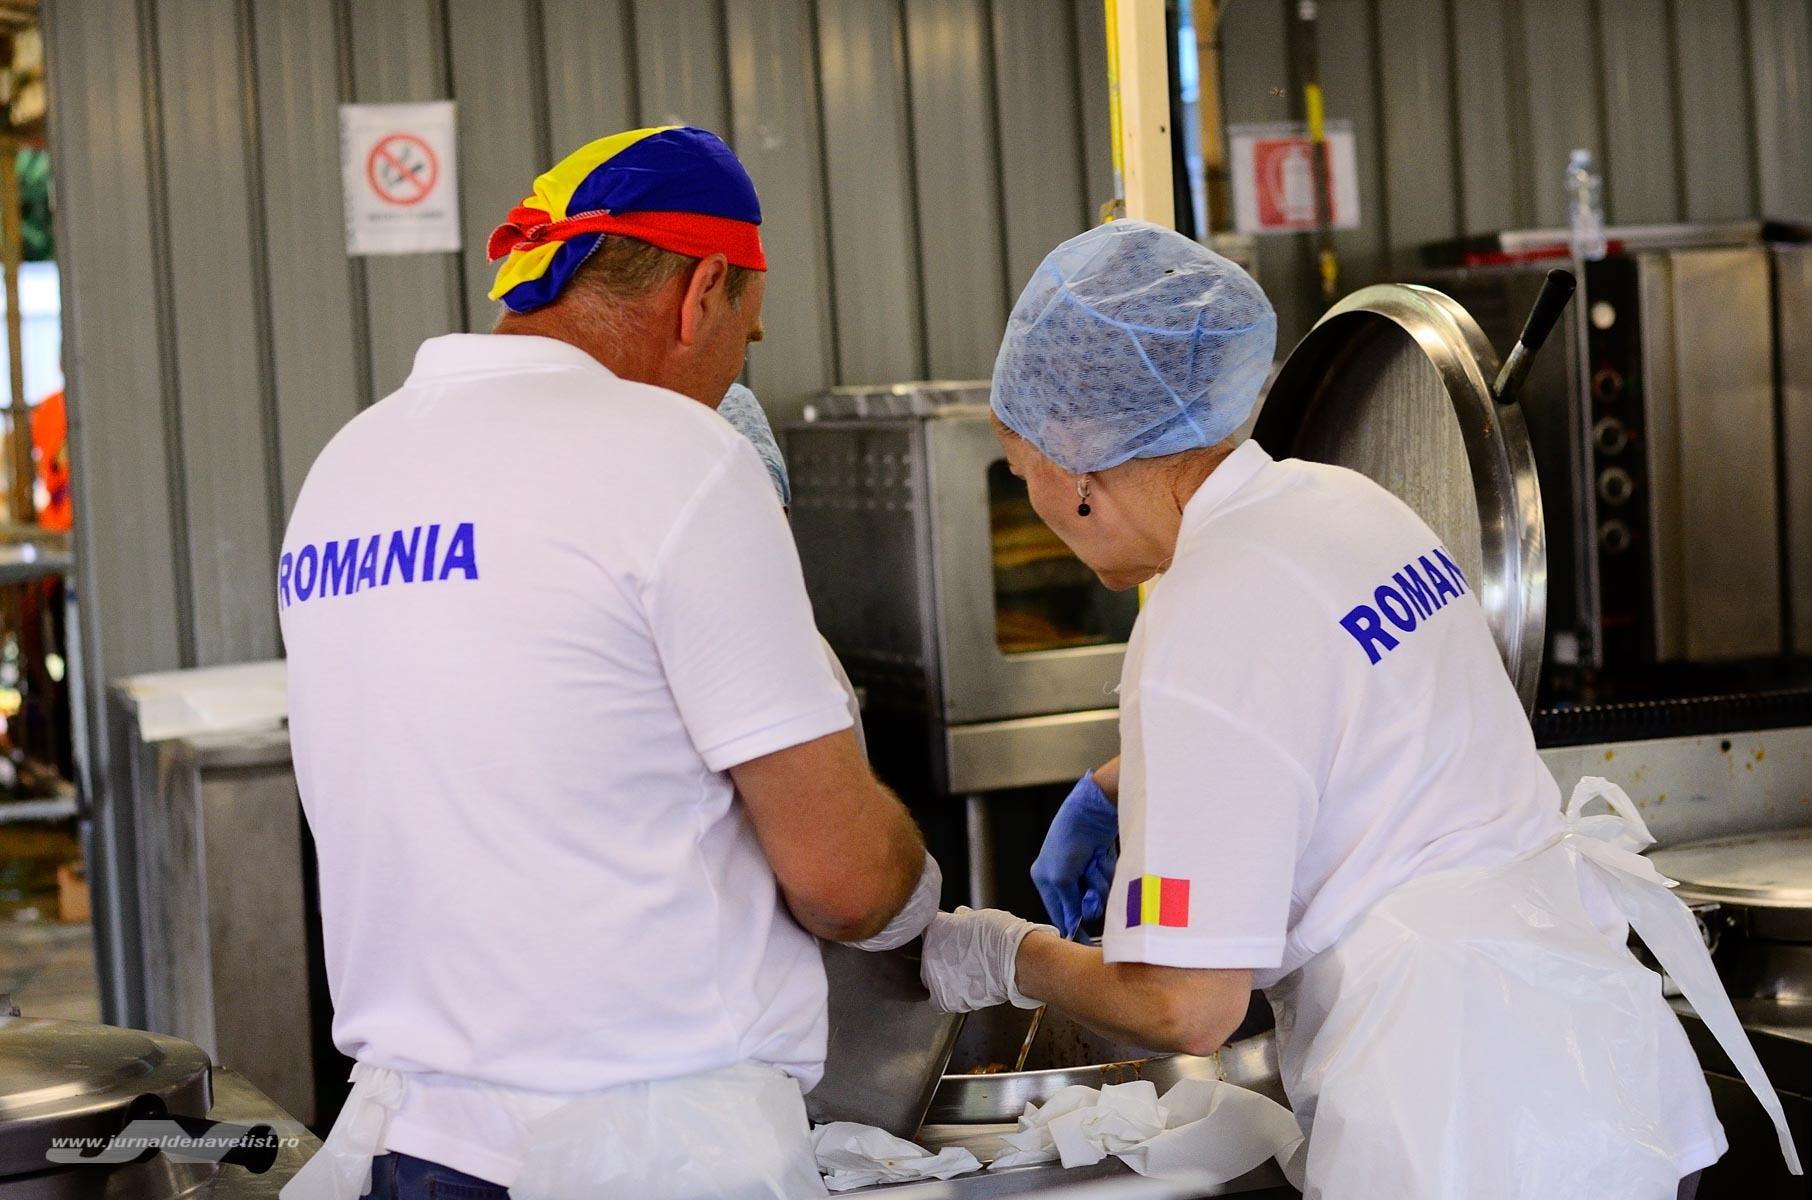 Romania Chiama Parma 7531